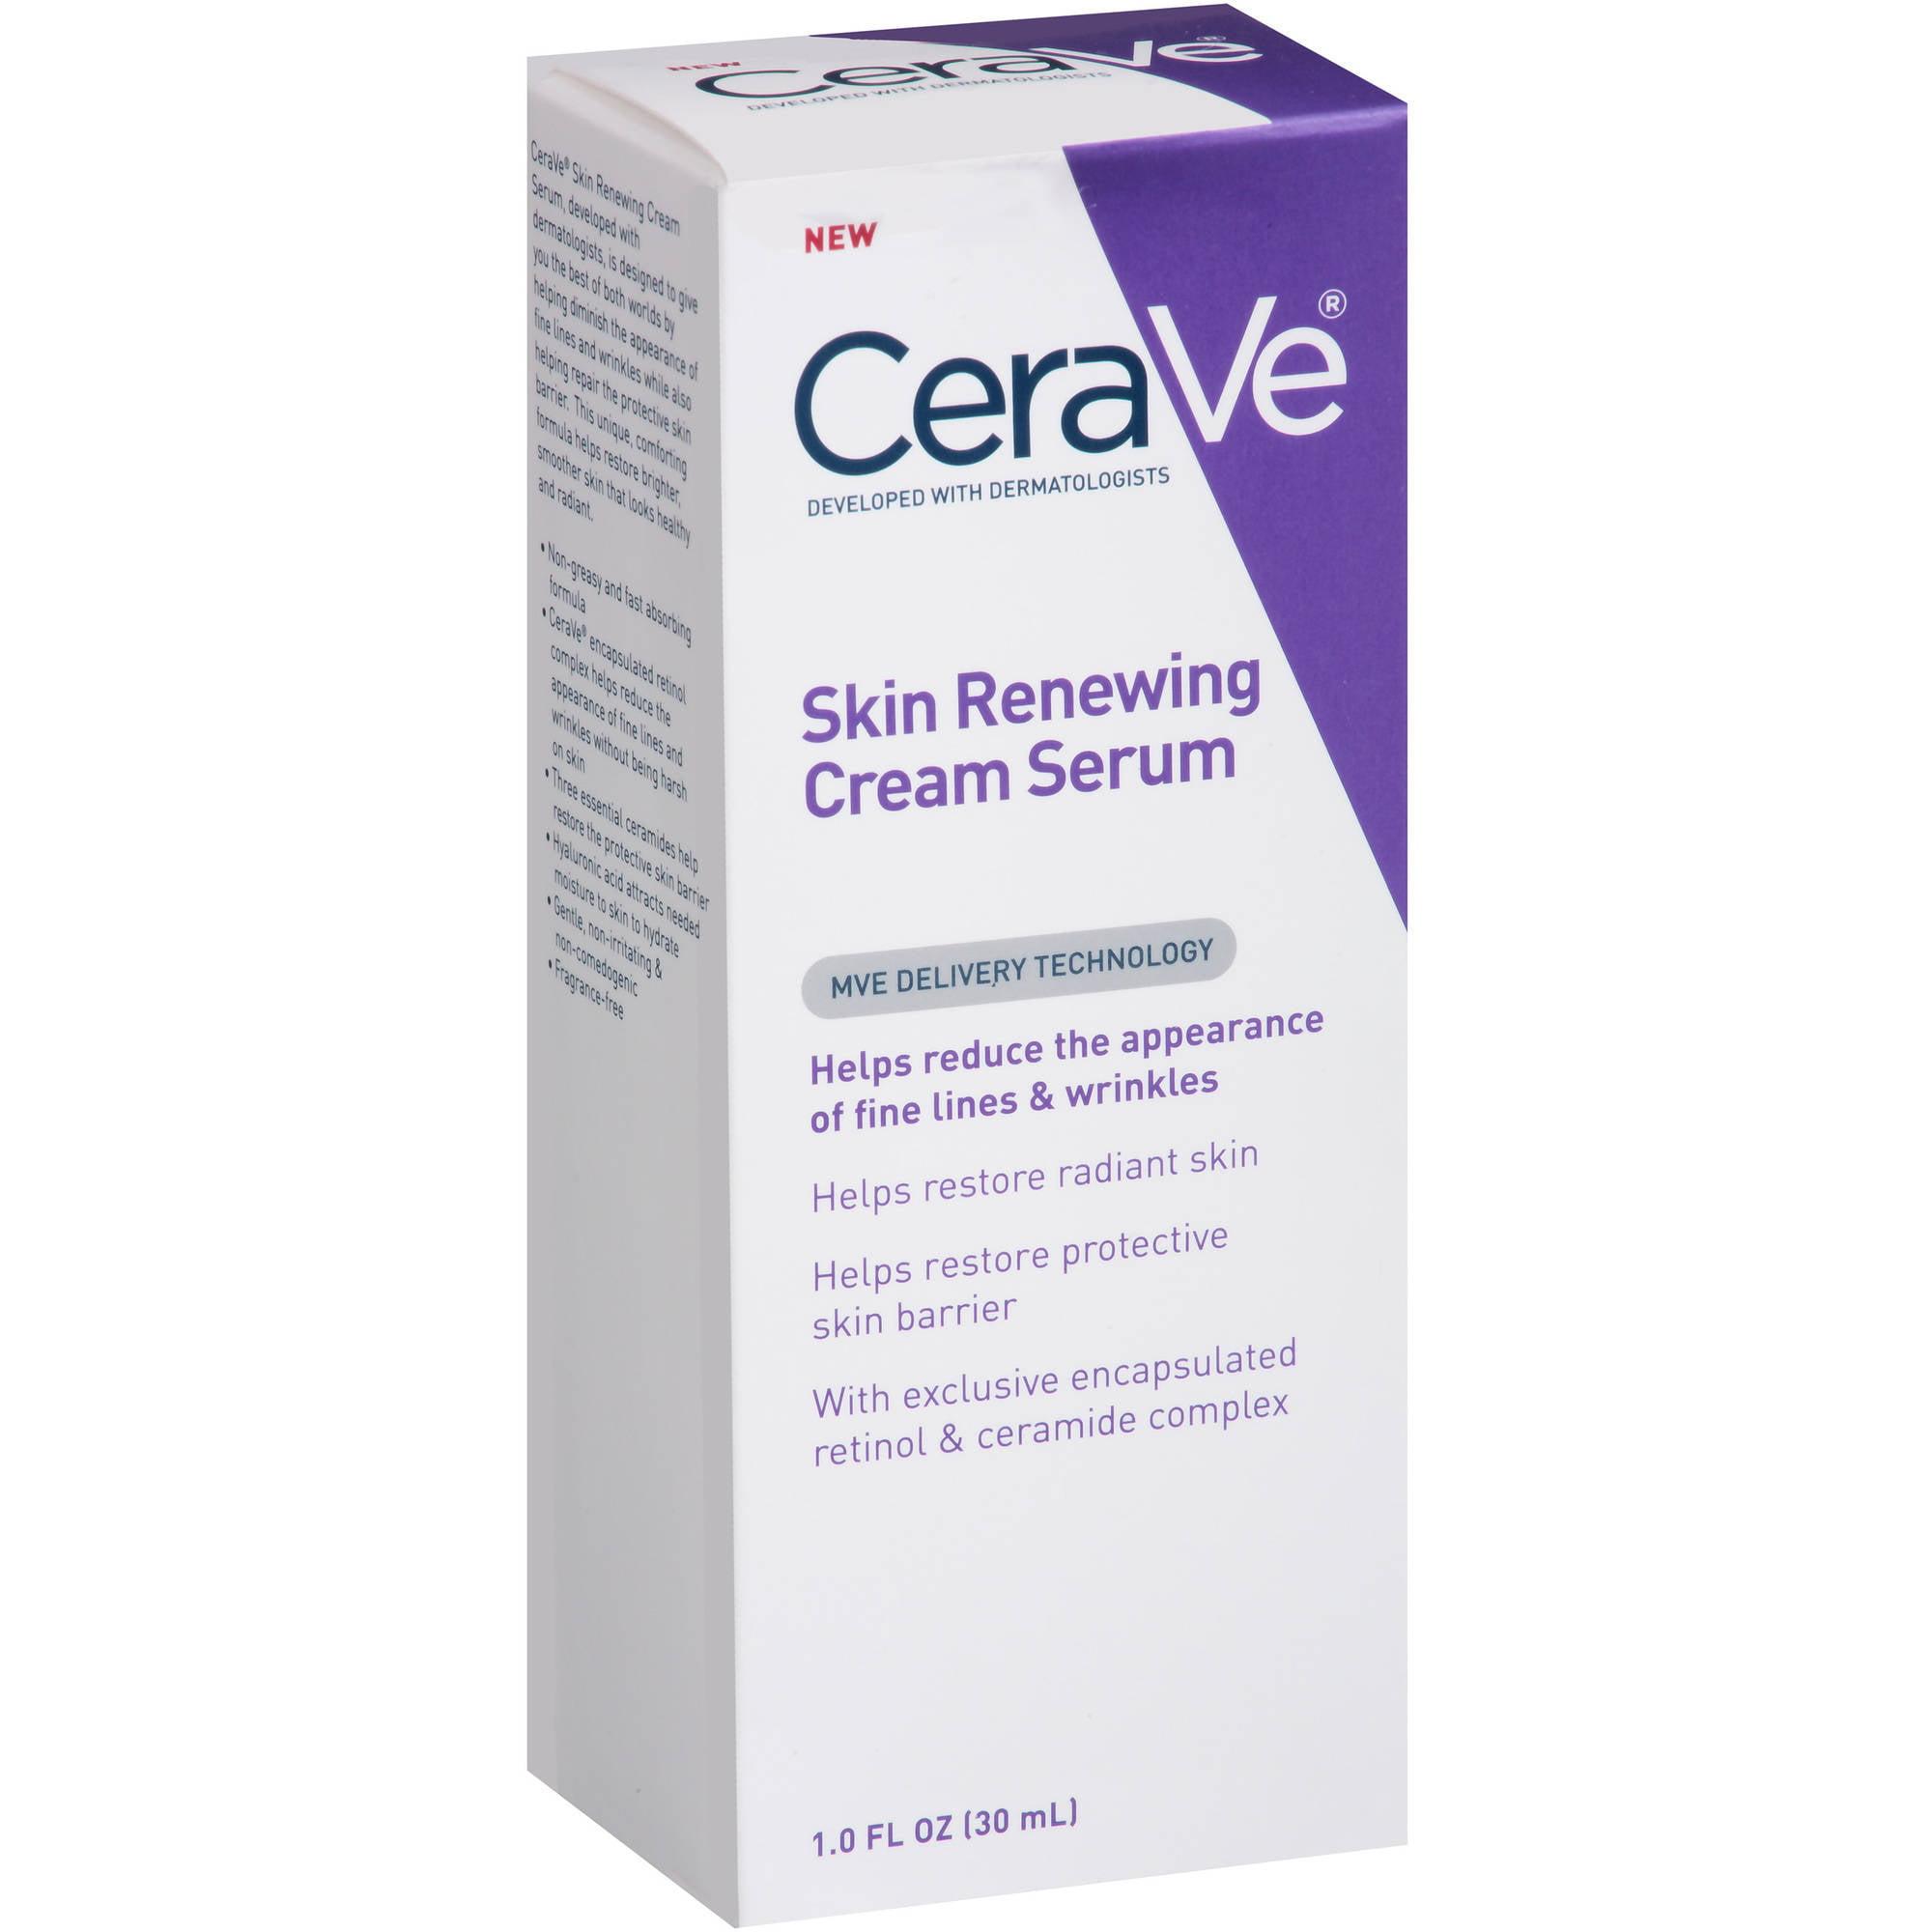 CeraVe Skin Renewing Cream Serum, 1 fl oz